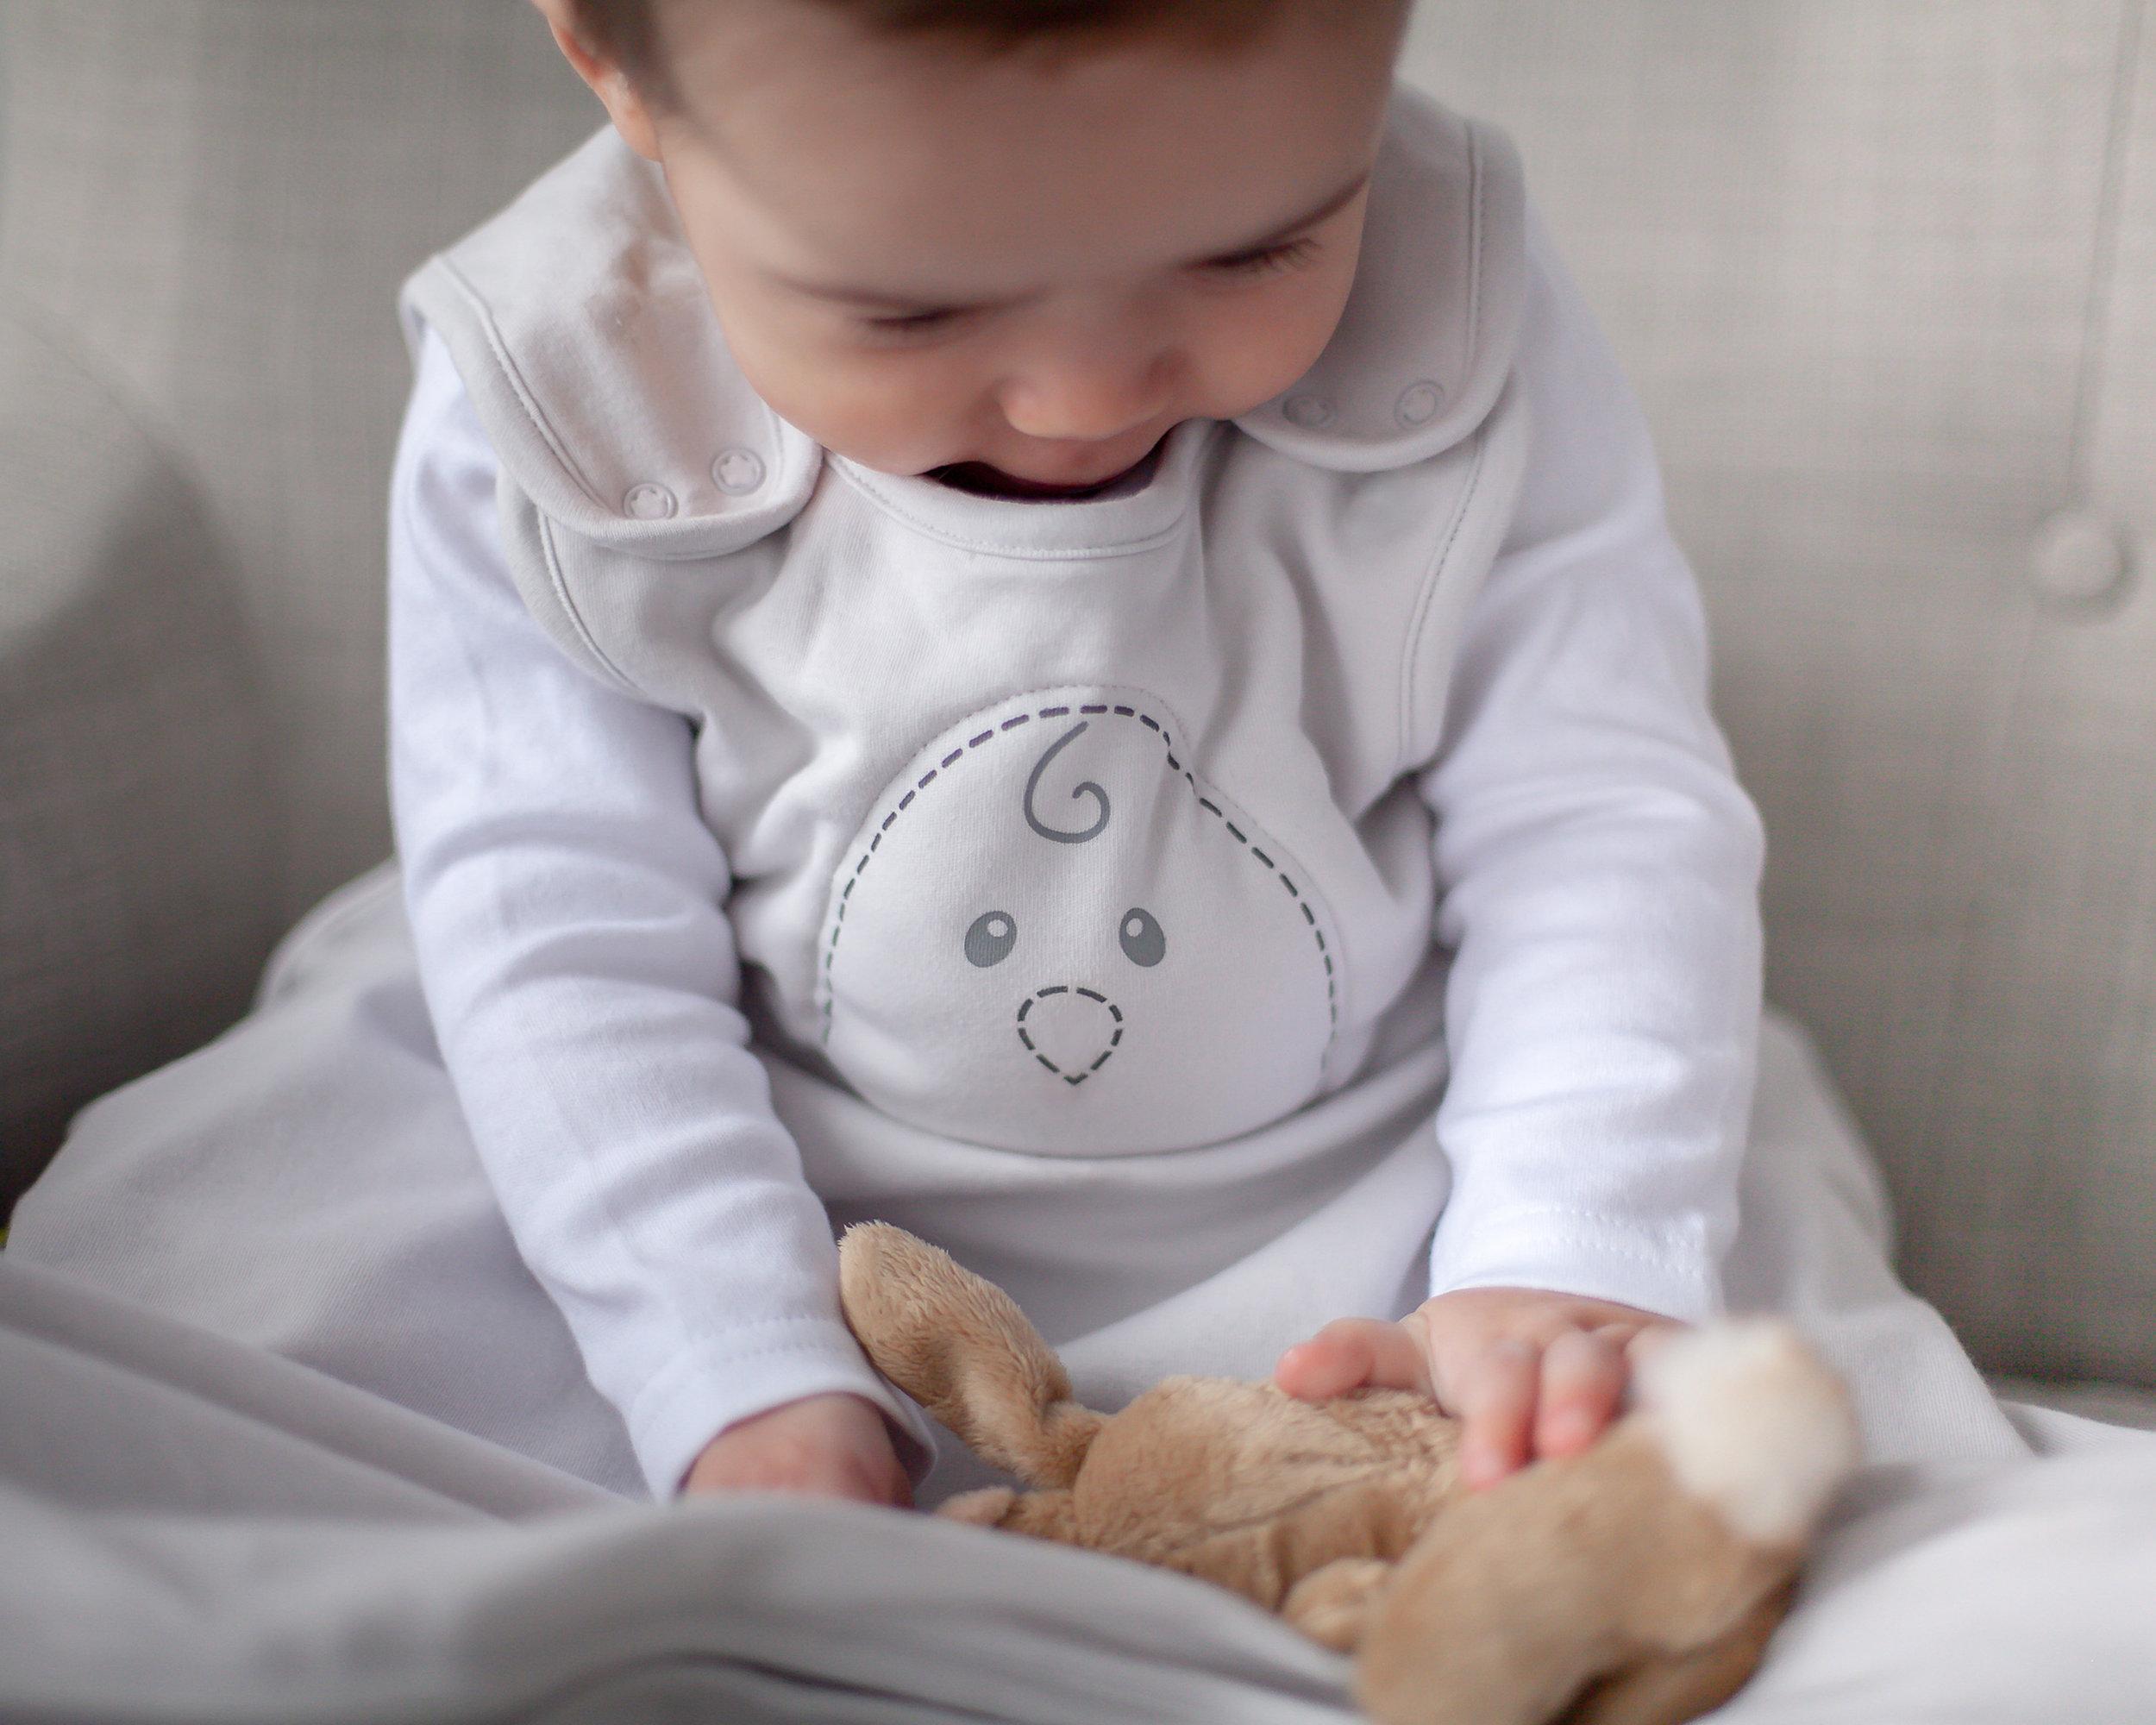 BNested_Bean_Brand_Photoshoot_Brand_Photography_Petra_King_Photography_Oshawa_Bowmanville_Toronto_GTA_Baby_Brand_Photography